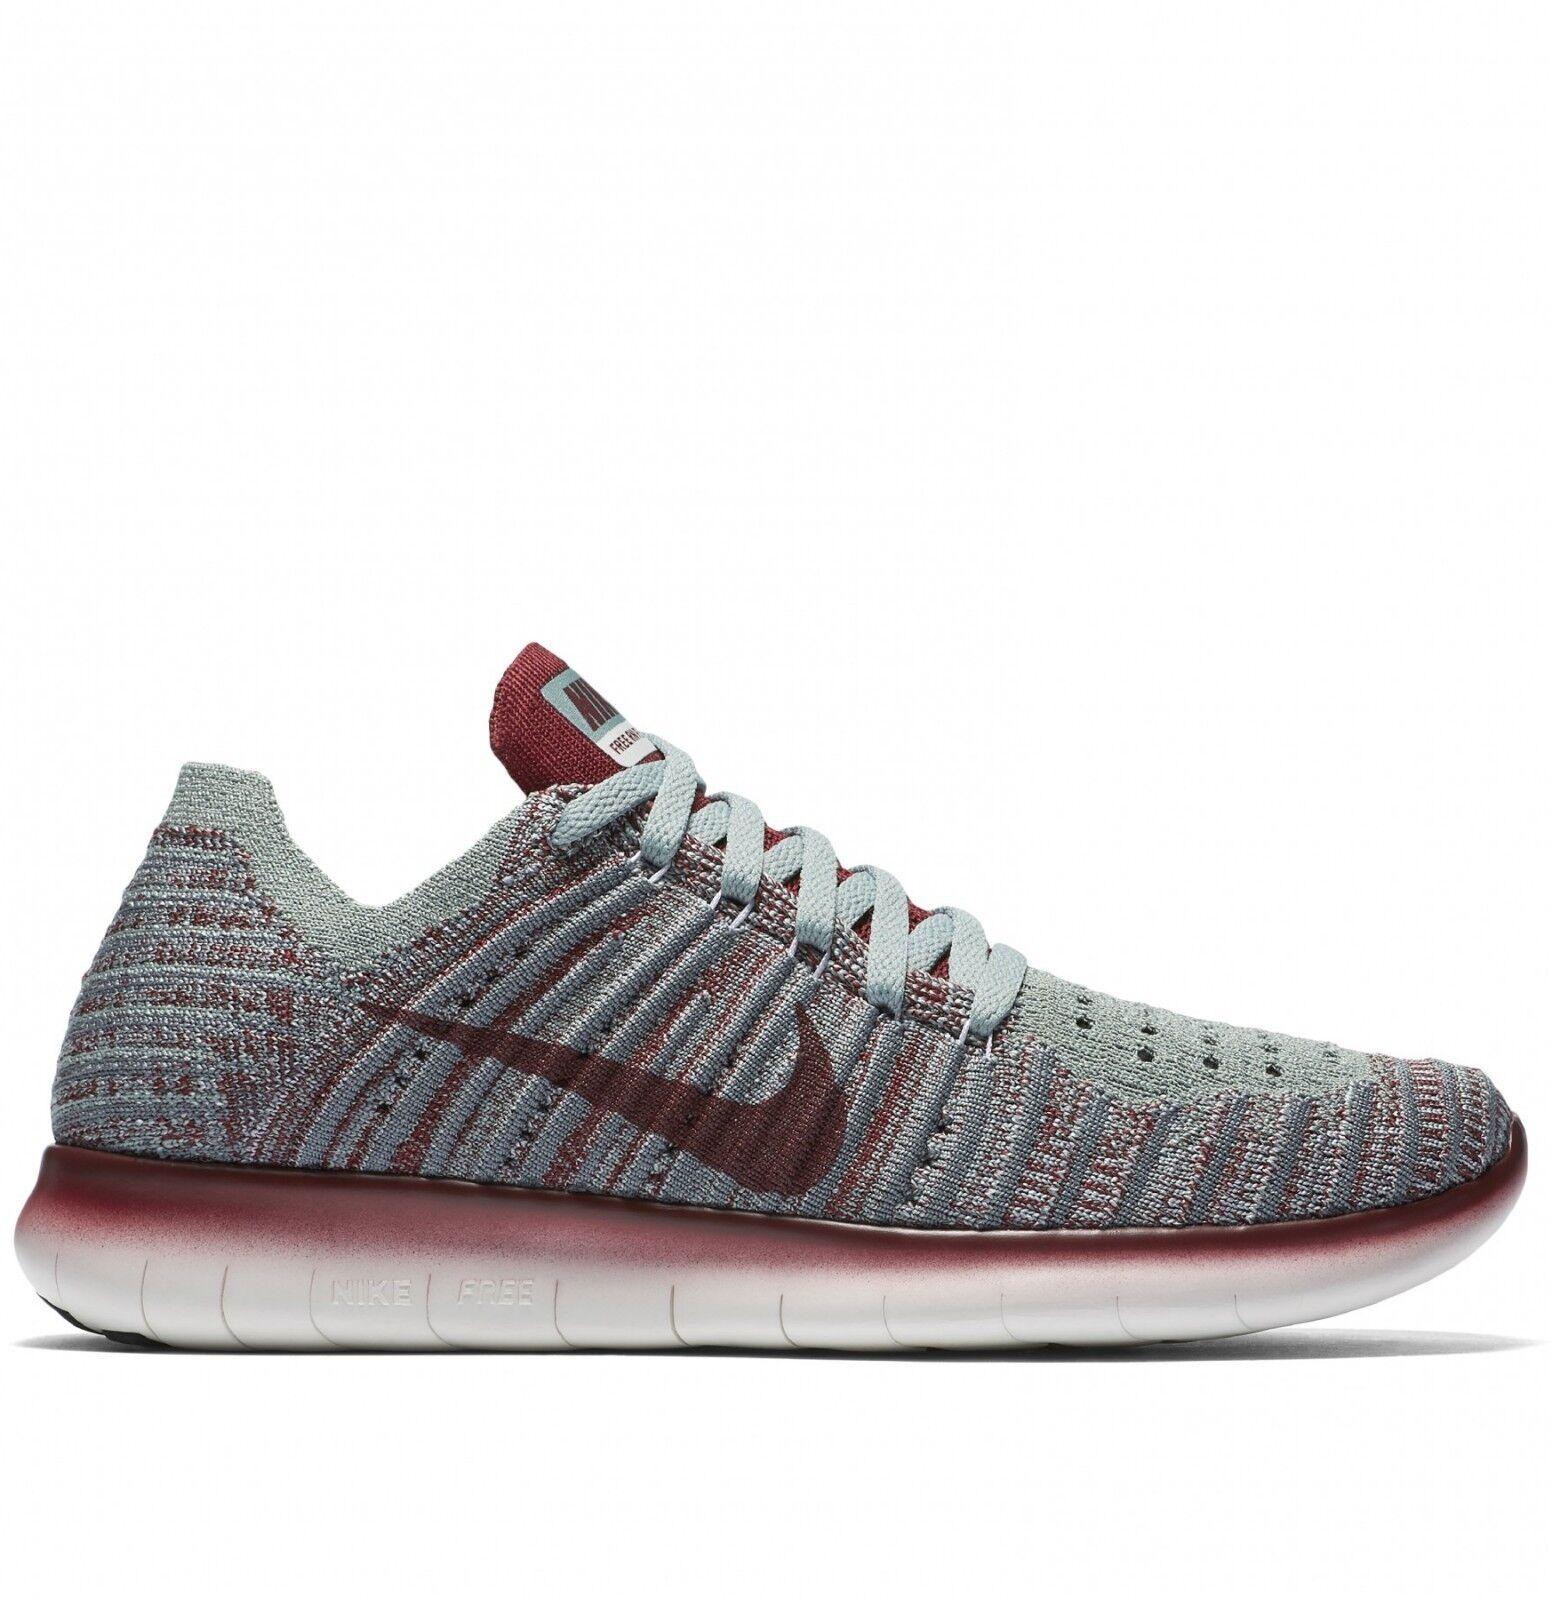 Wmns Nike Free RN Flyknit Gyakusou UK 6 EUR 40 New Wolf Grey TM Red  844101 006